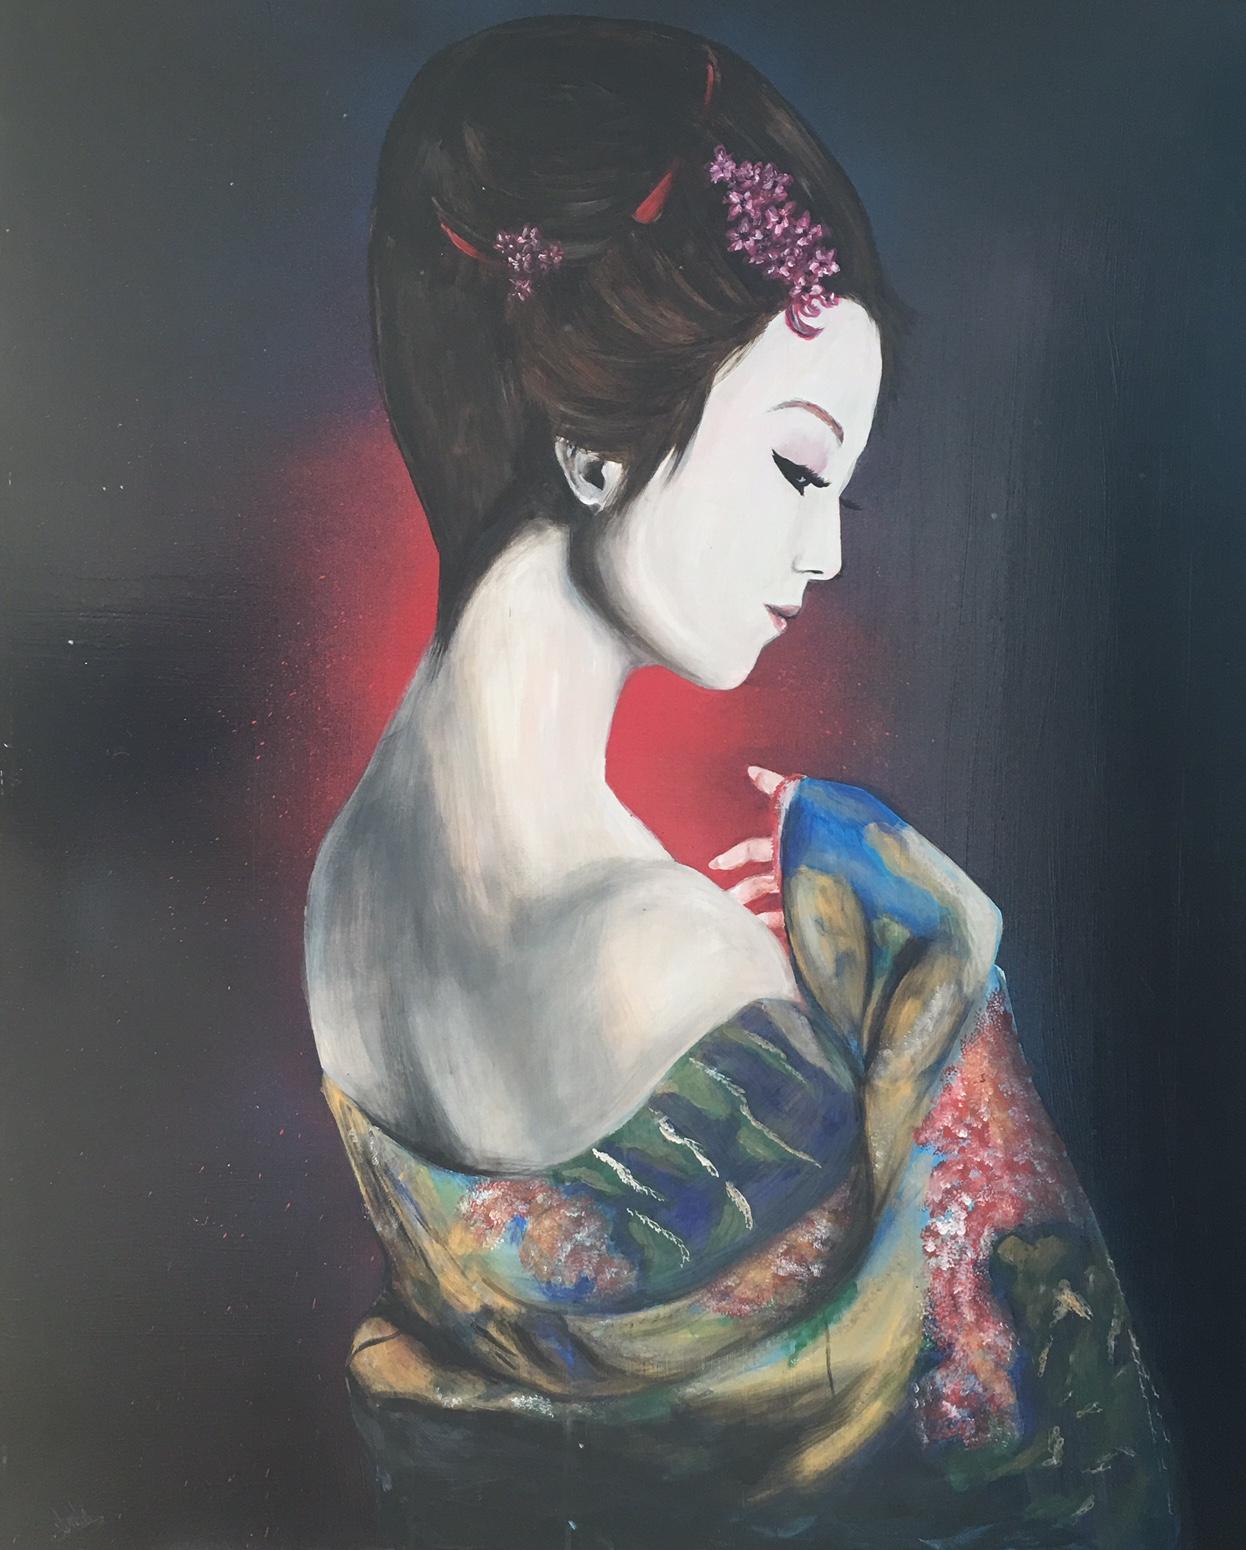 and Geisha slot